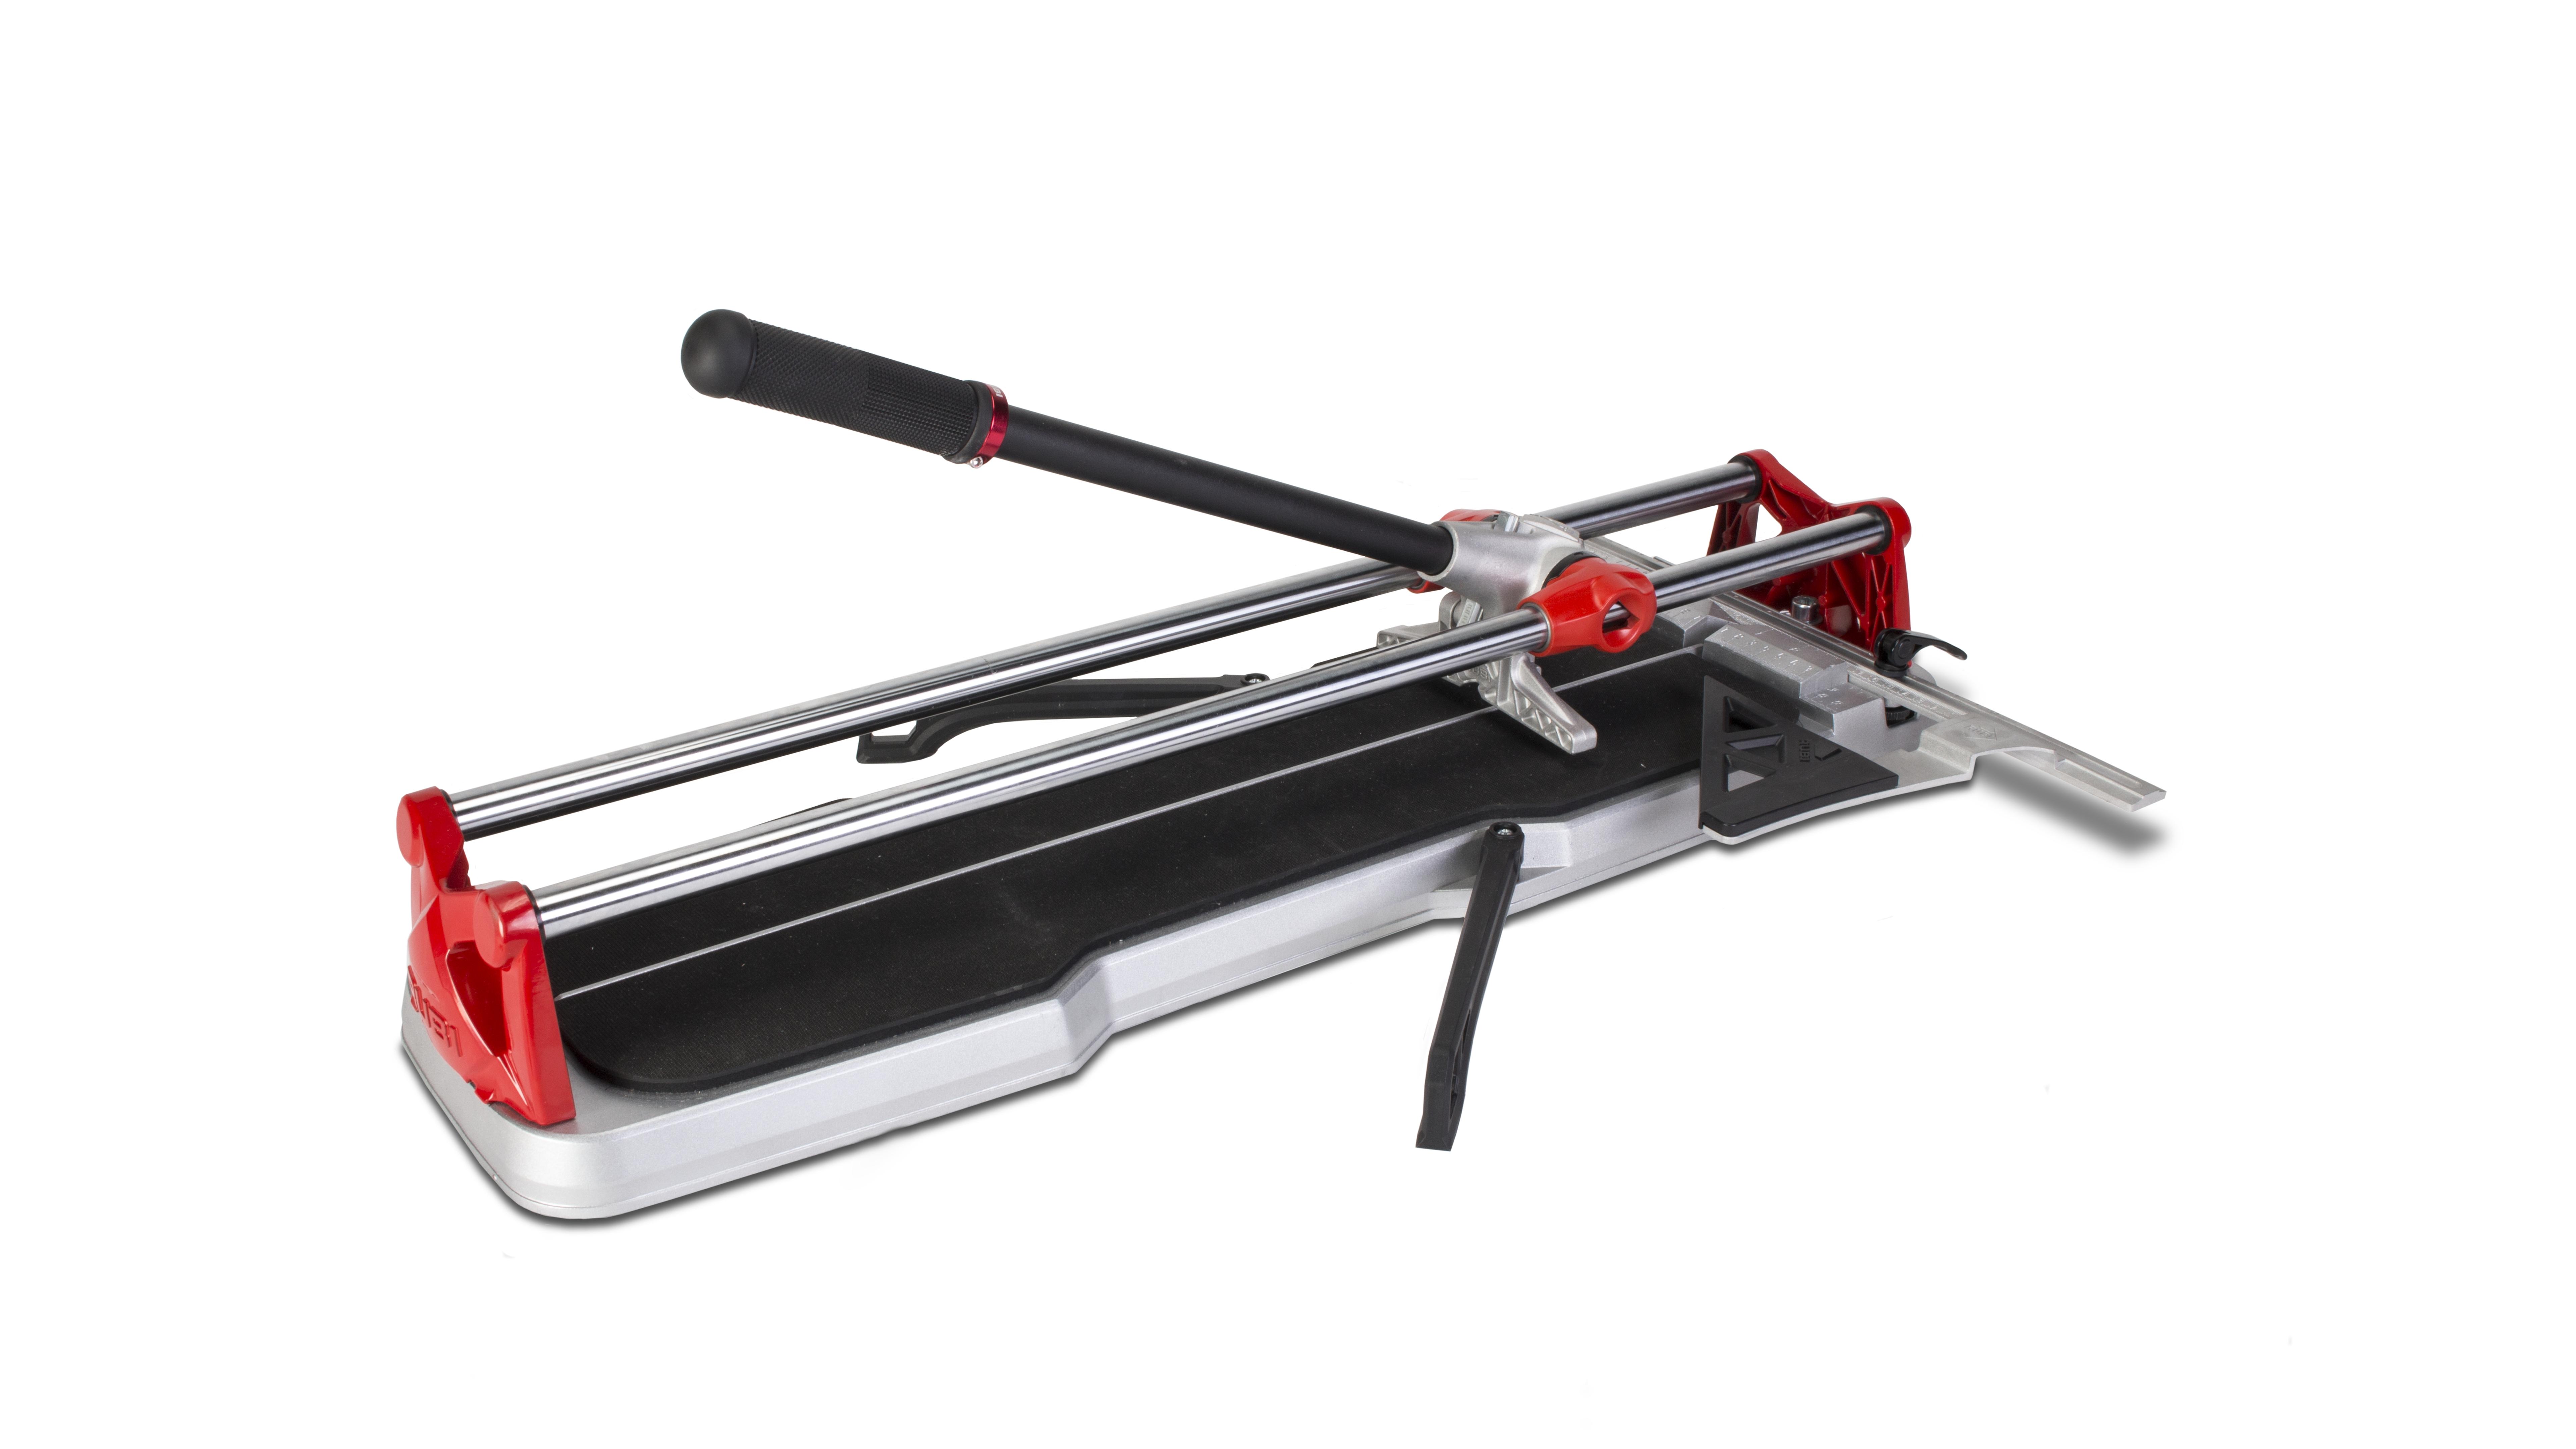 Cortadoras manuales speed magnet rubi tools netherland for Hormigon impreso rubi